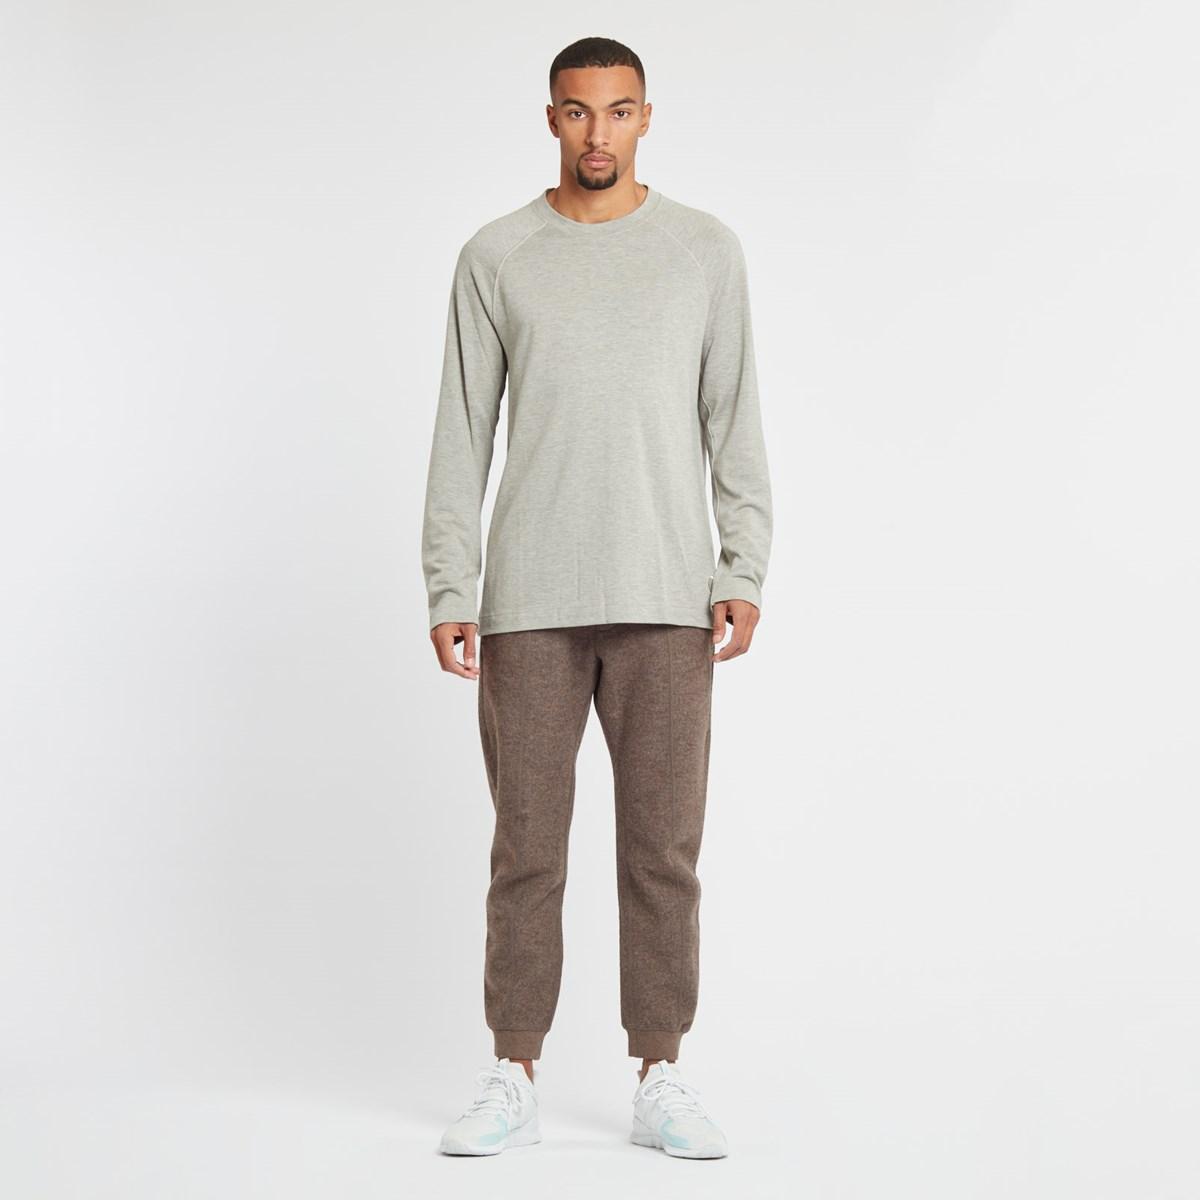 buy popular f55b6 91da5 adidas Long Sleeve Tee - Br0159 - Sneakersnstuff  sneakers  streetwear  online since 1999